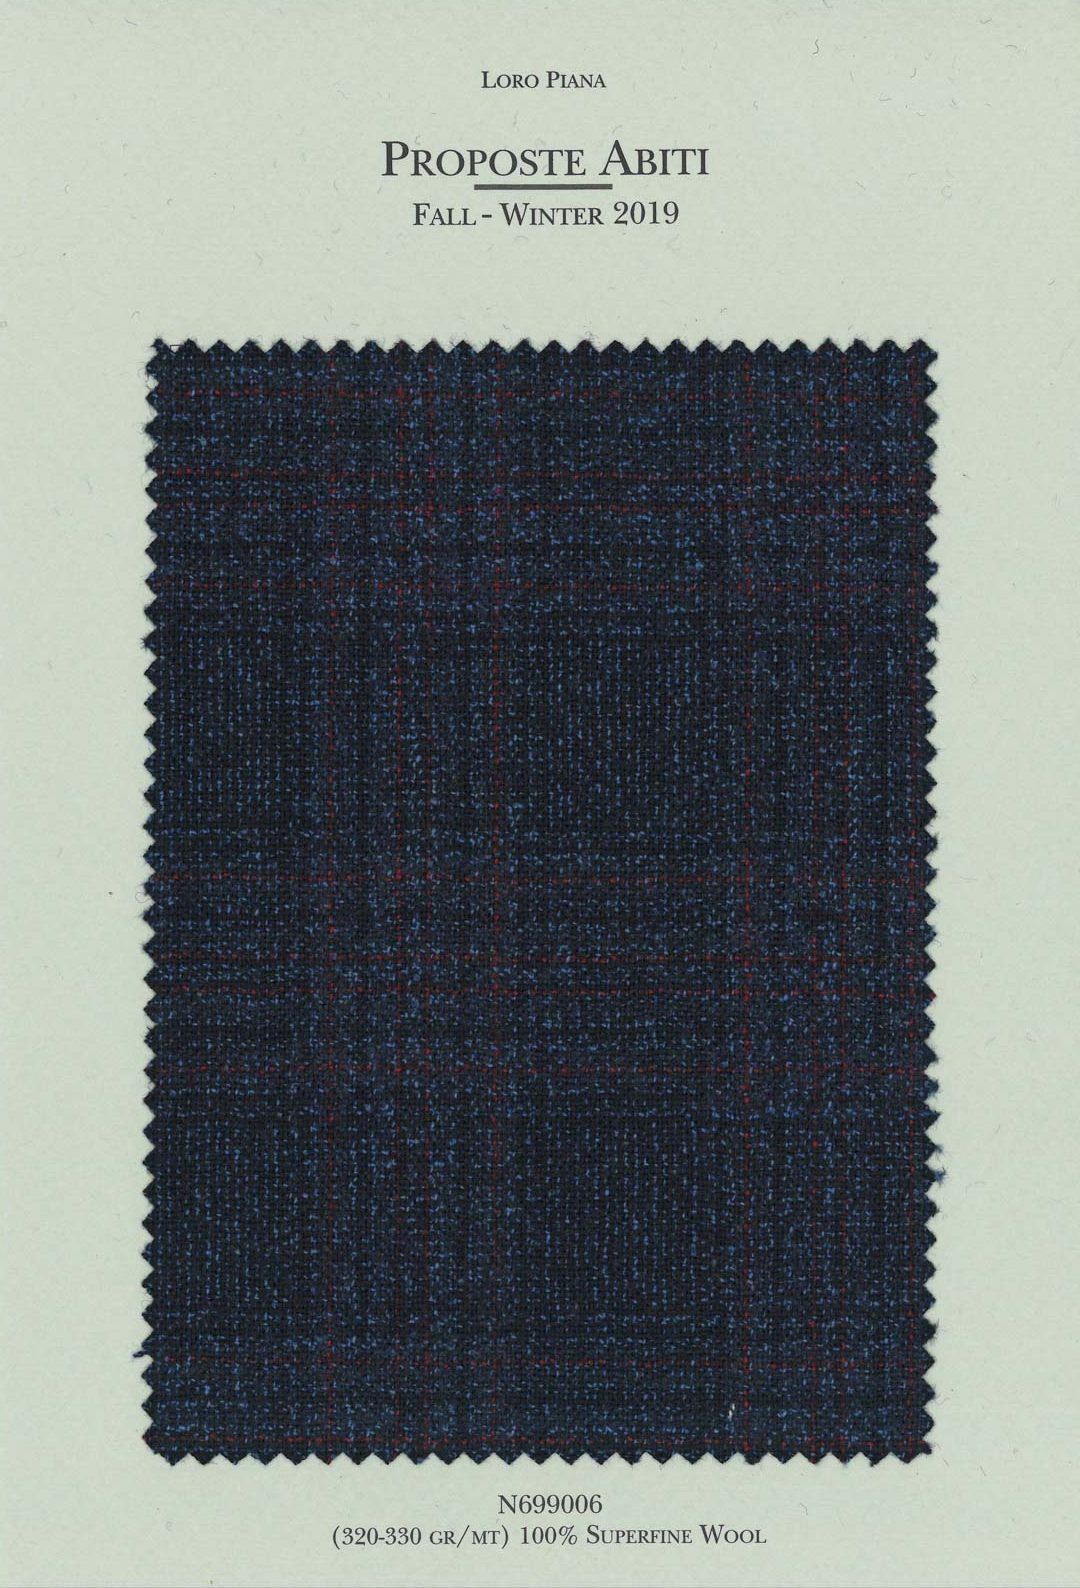 Lpn699006